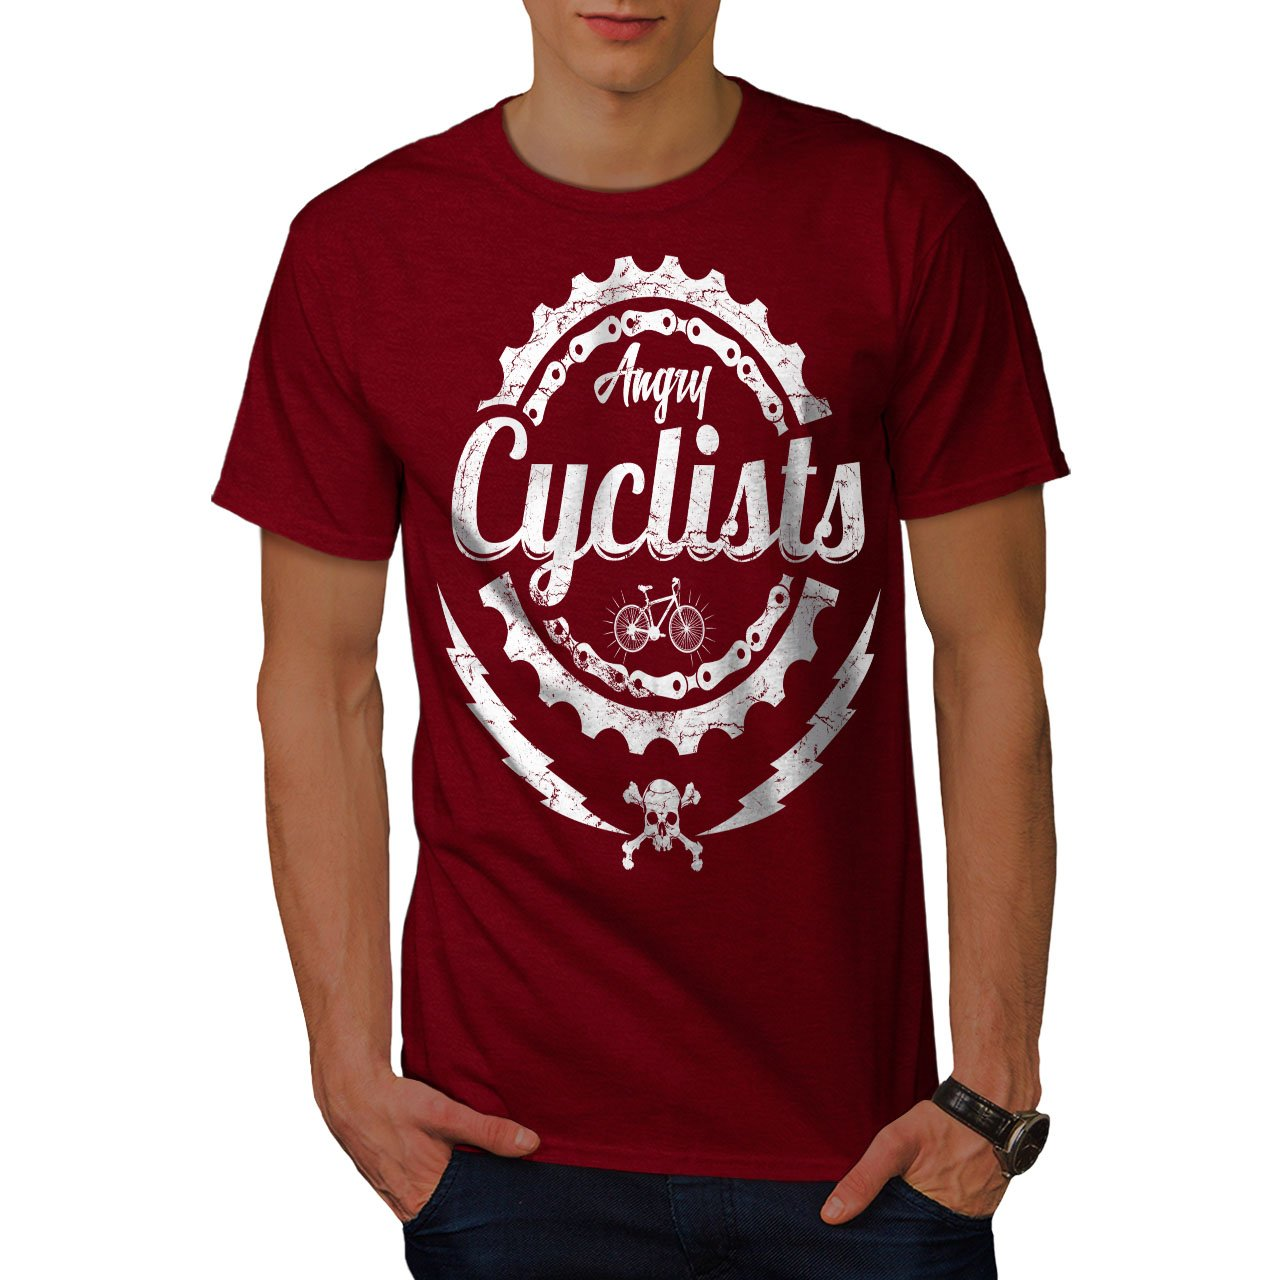 Angry Cyclist Cool S Bike Graphic Printed 9566 Shirts